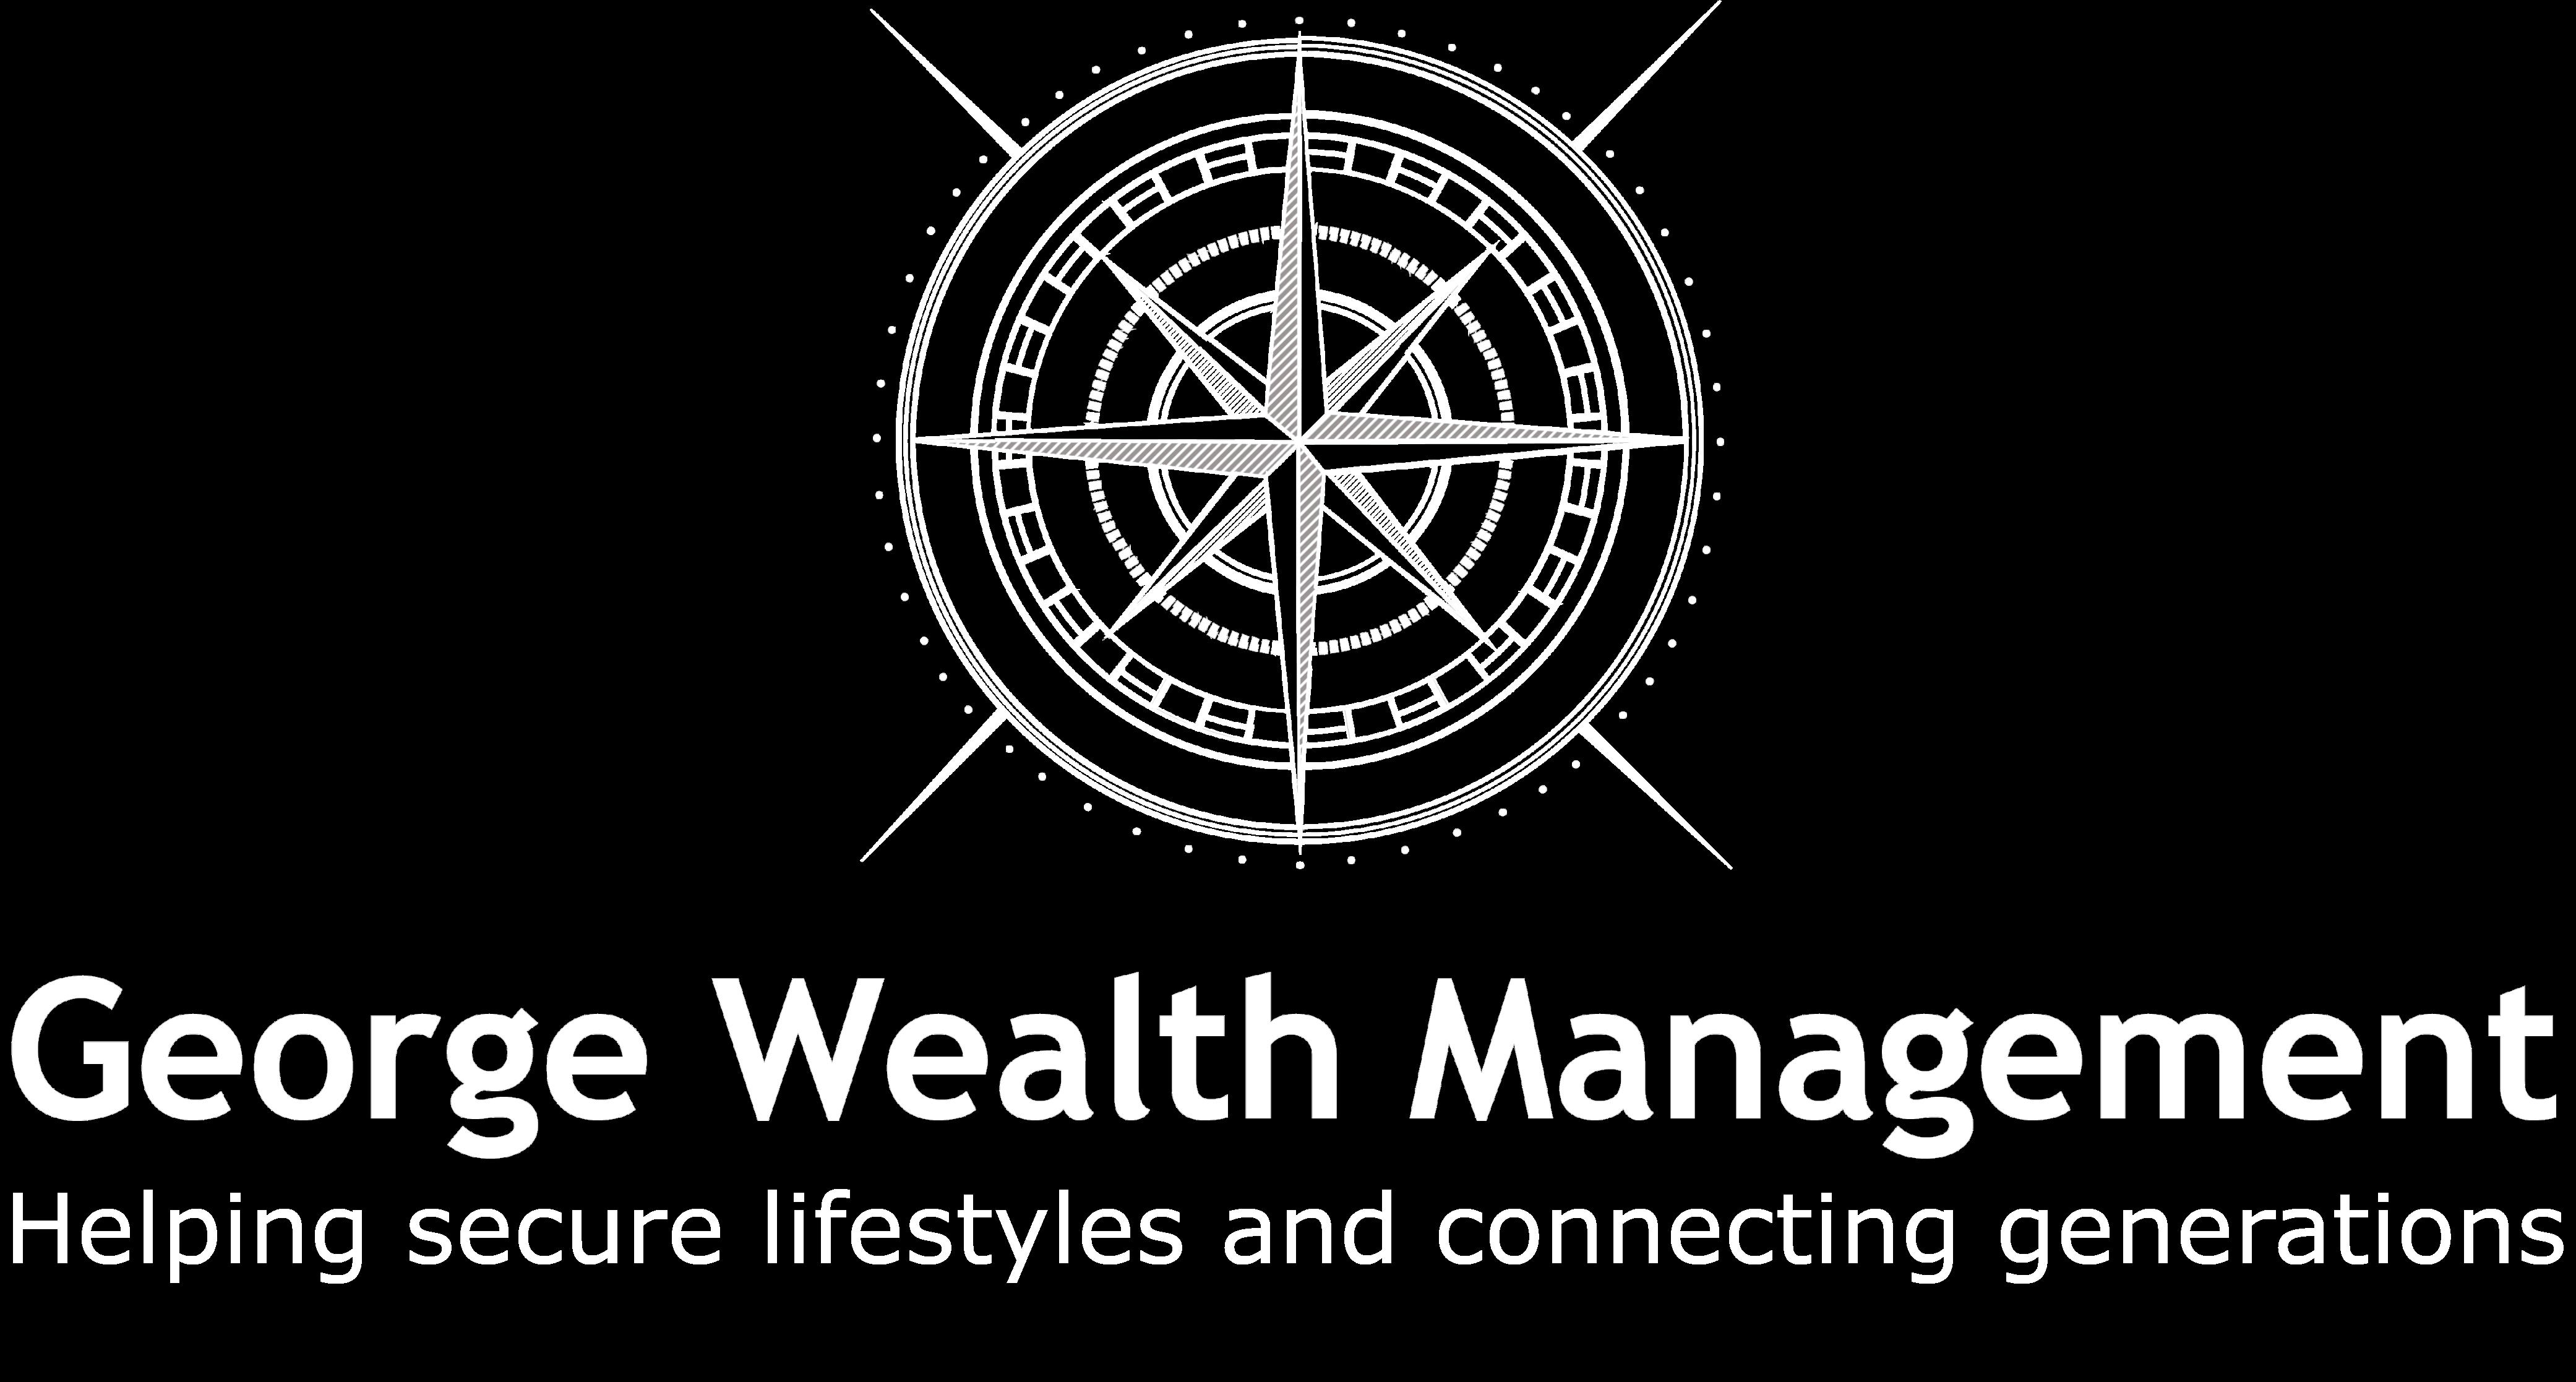 Logo for George Wealth Management